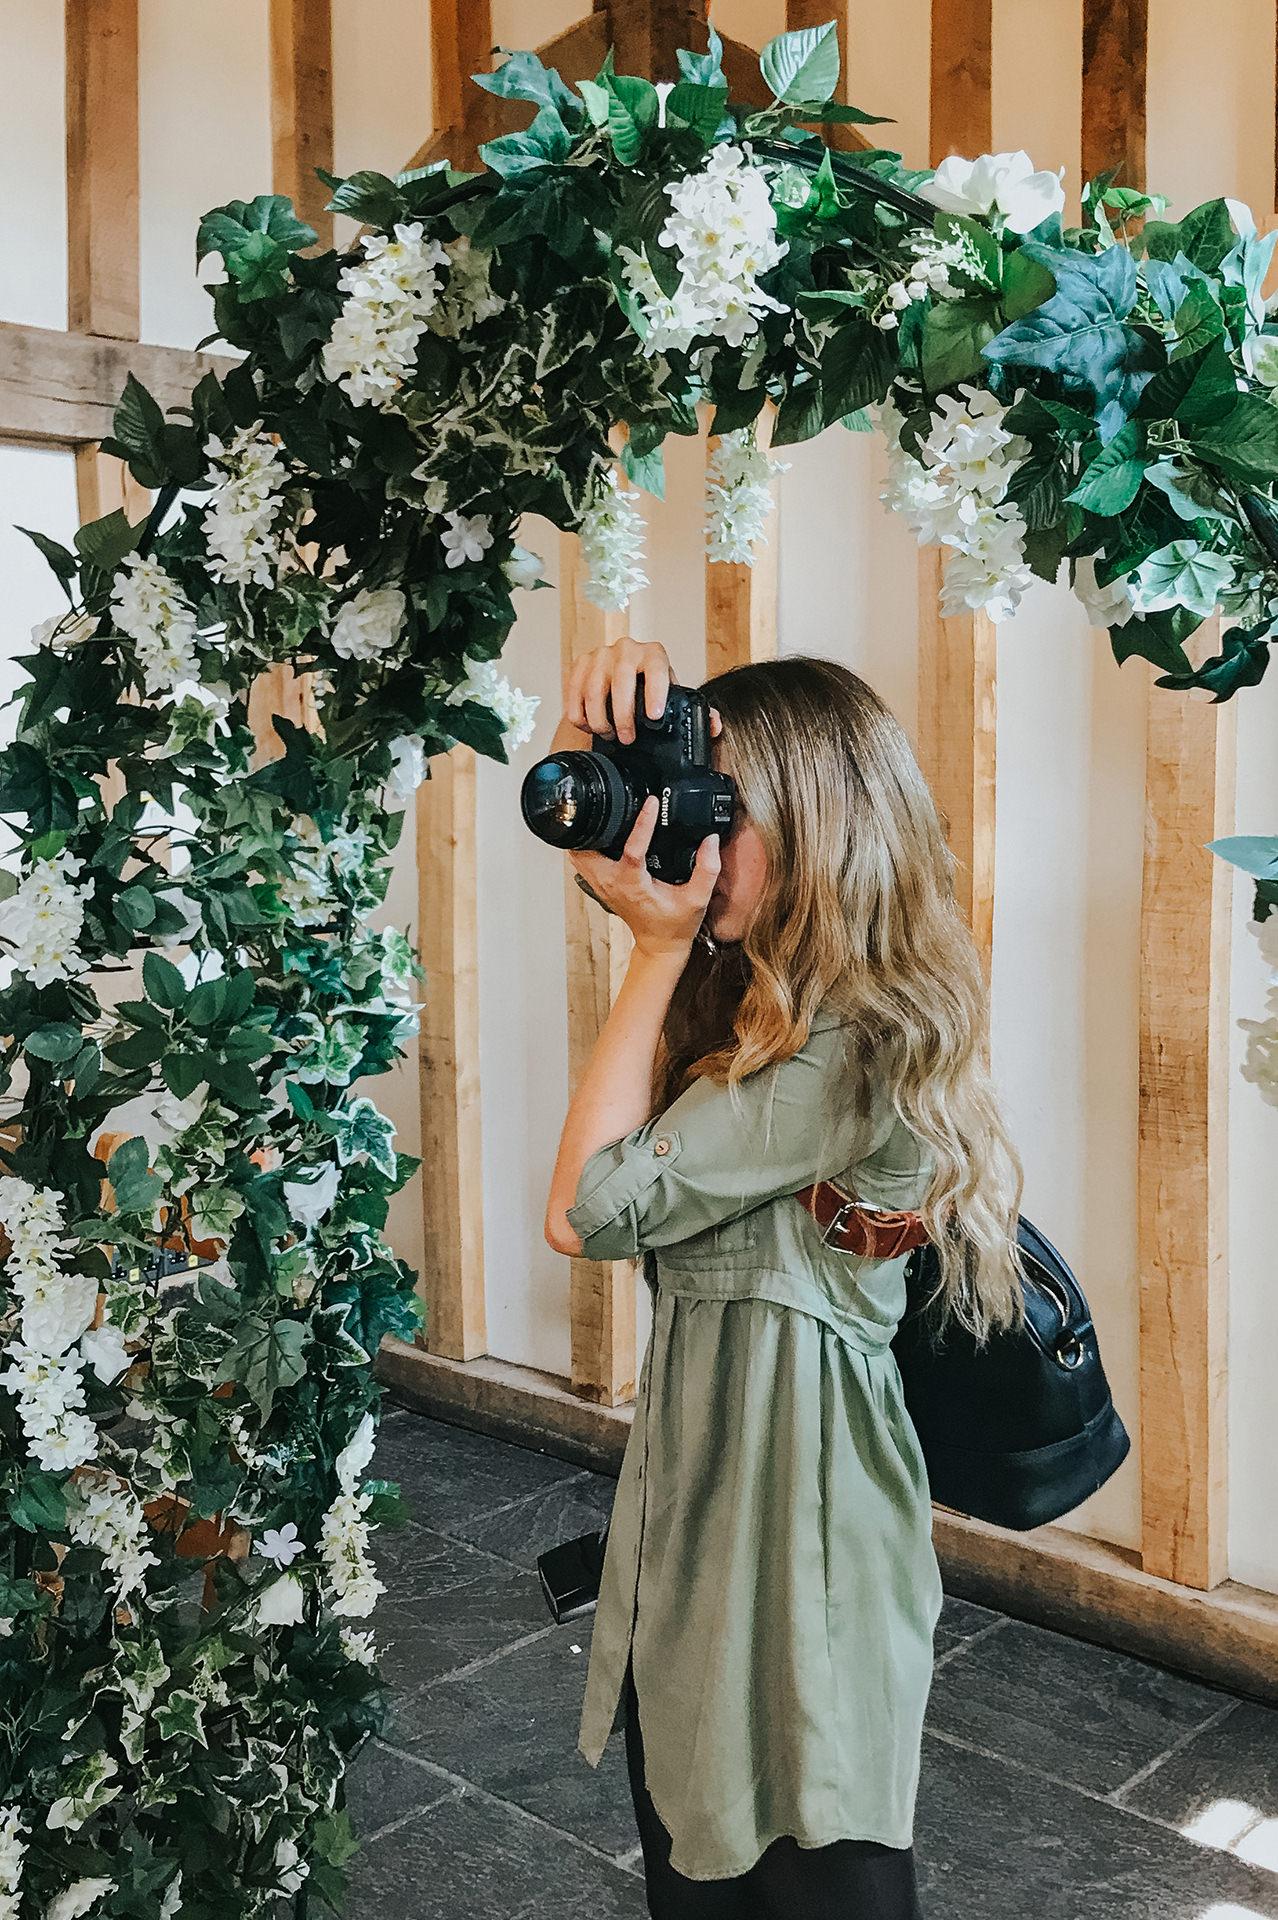 photographer working on wedding day